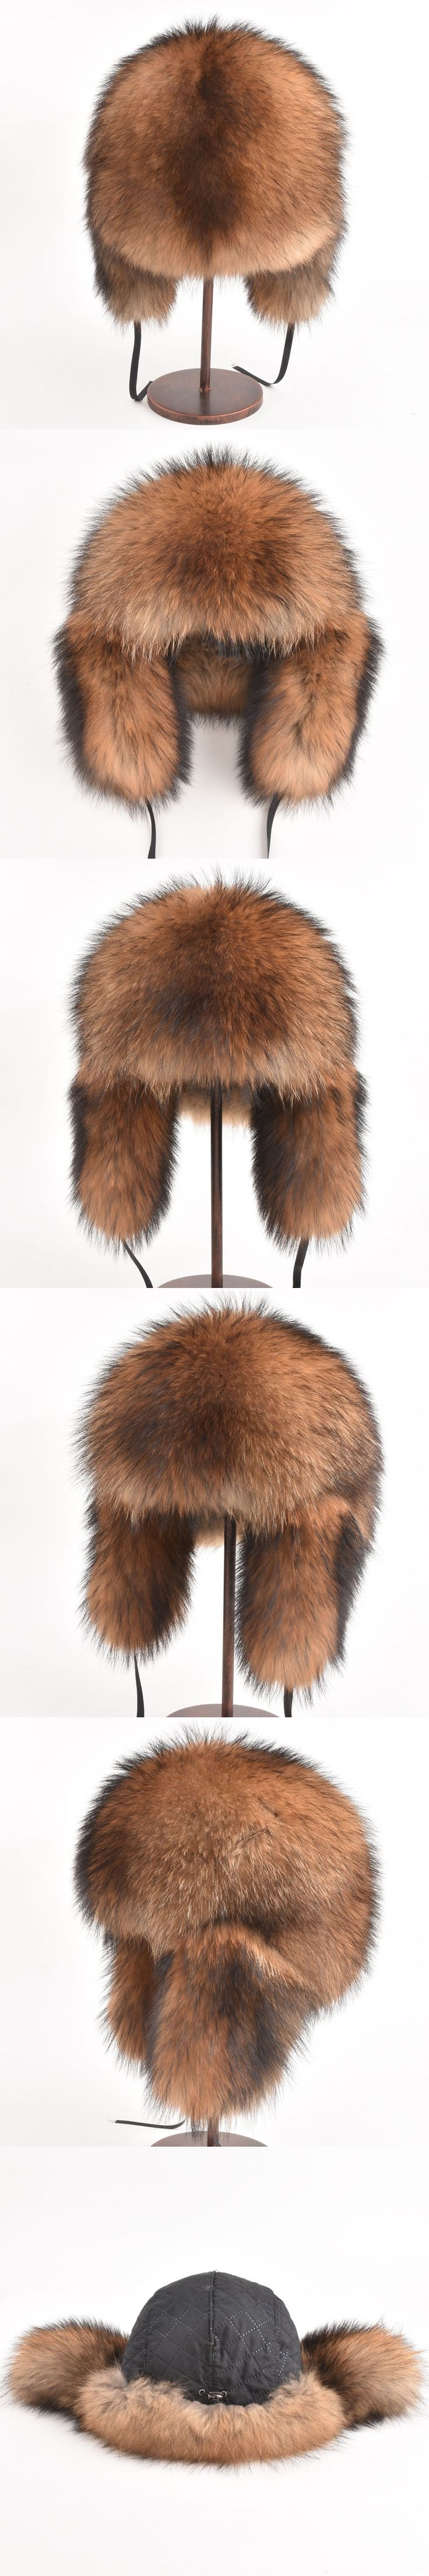 Real Fox Fur hat Bomber Hats Raccoon Fur Hats Women Men Warm Genuine Fur Female Brown Natural Fur Unisex Russian Bomber Winter